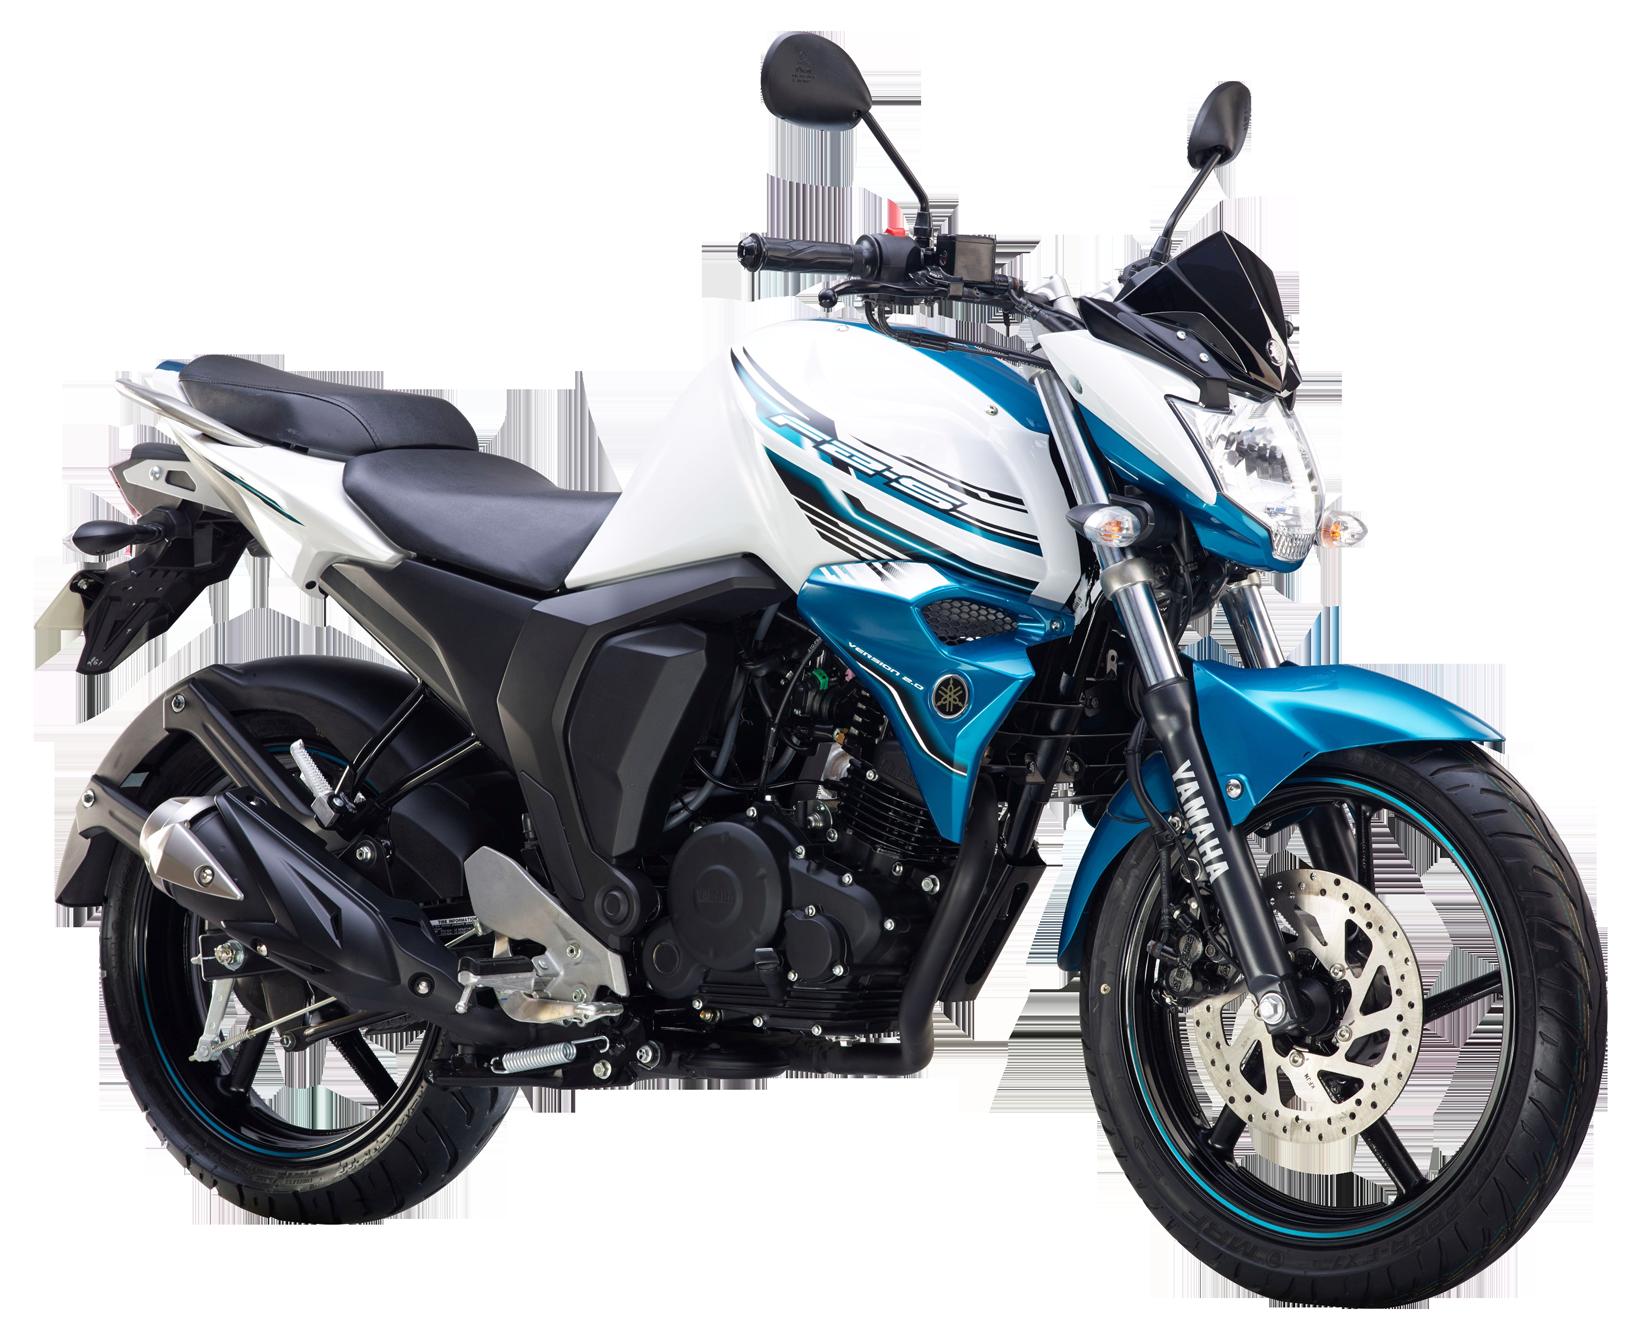 Yamaha FZ S FI White PNG Image